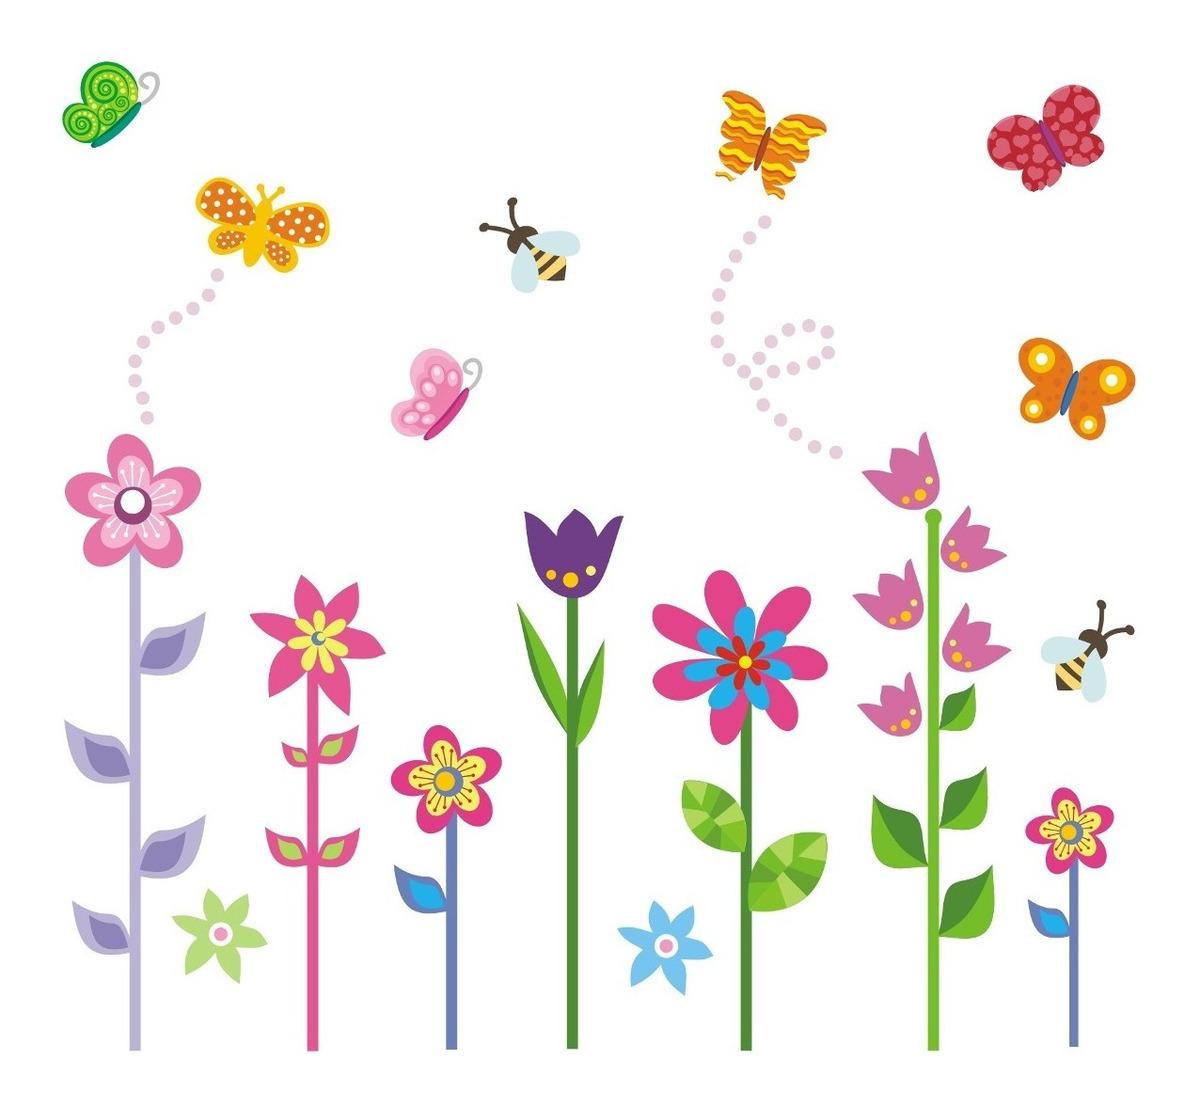 Adesivo Infantil Decorativo Quarto Menina Borboleta Bebe Flores